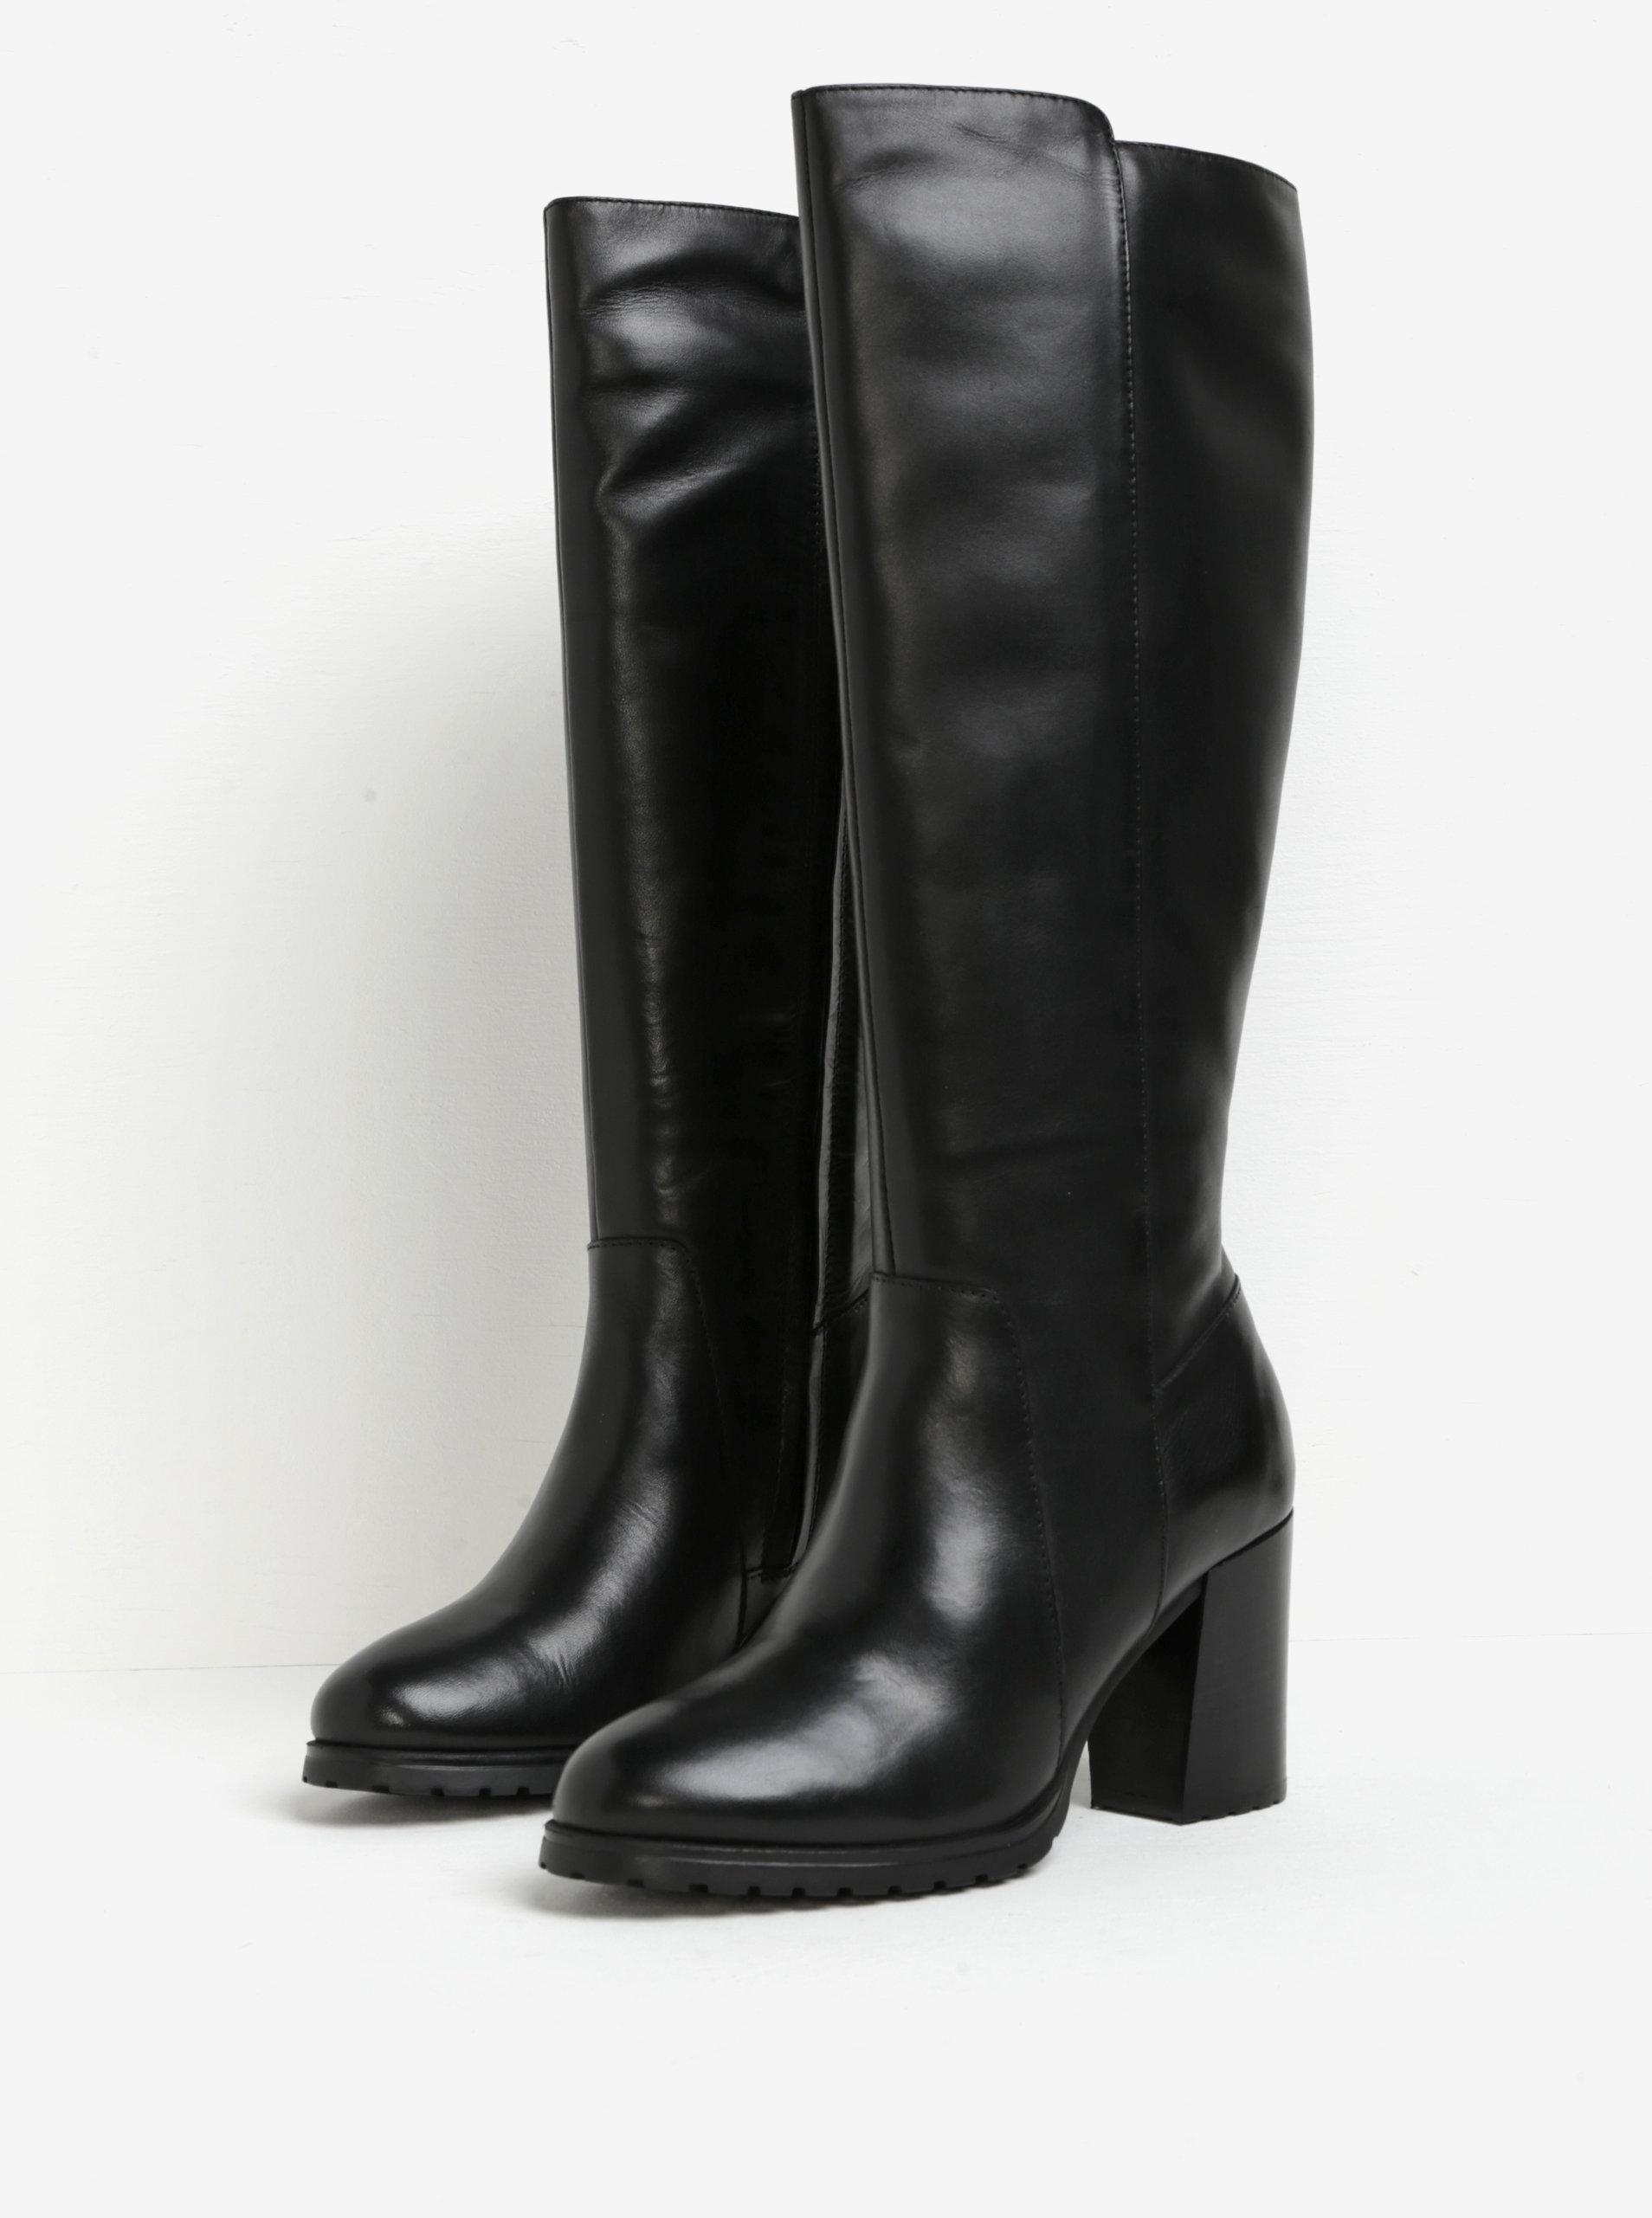 Čierne kožené čižmy s gumovou vložkou Geox New Lise ... 0f629a79710